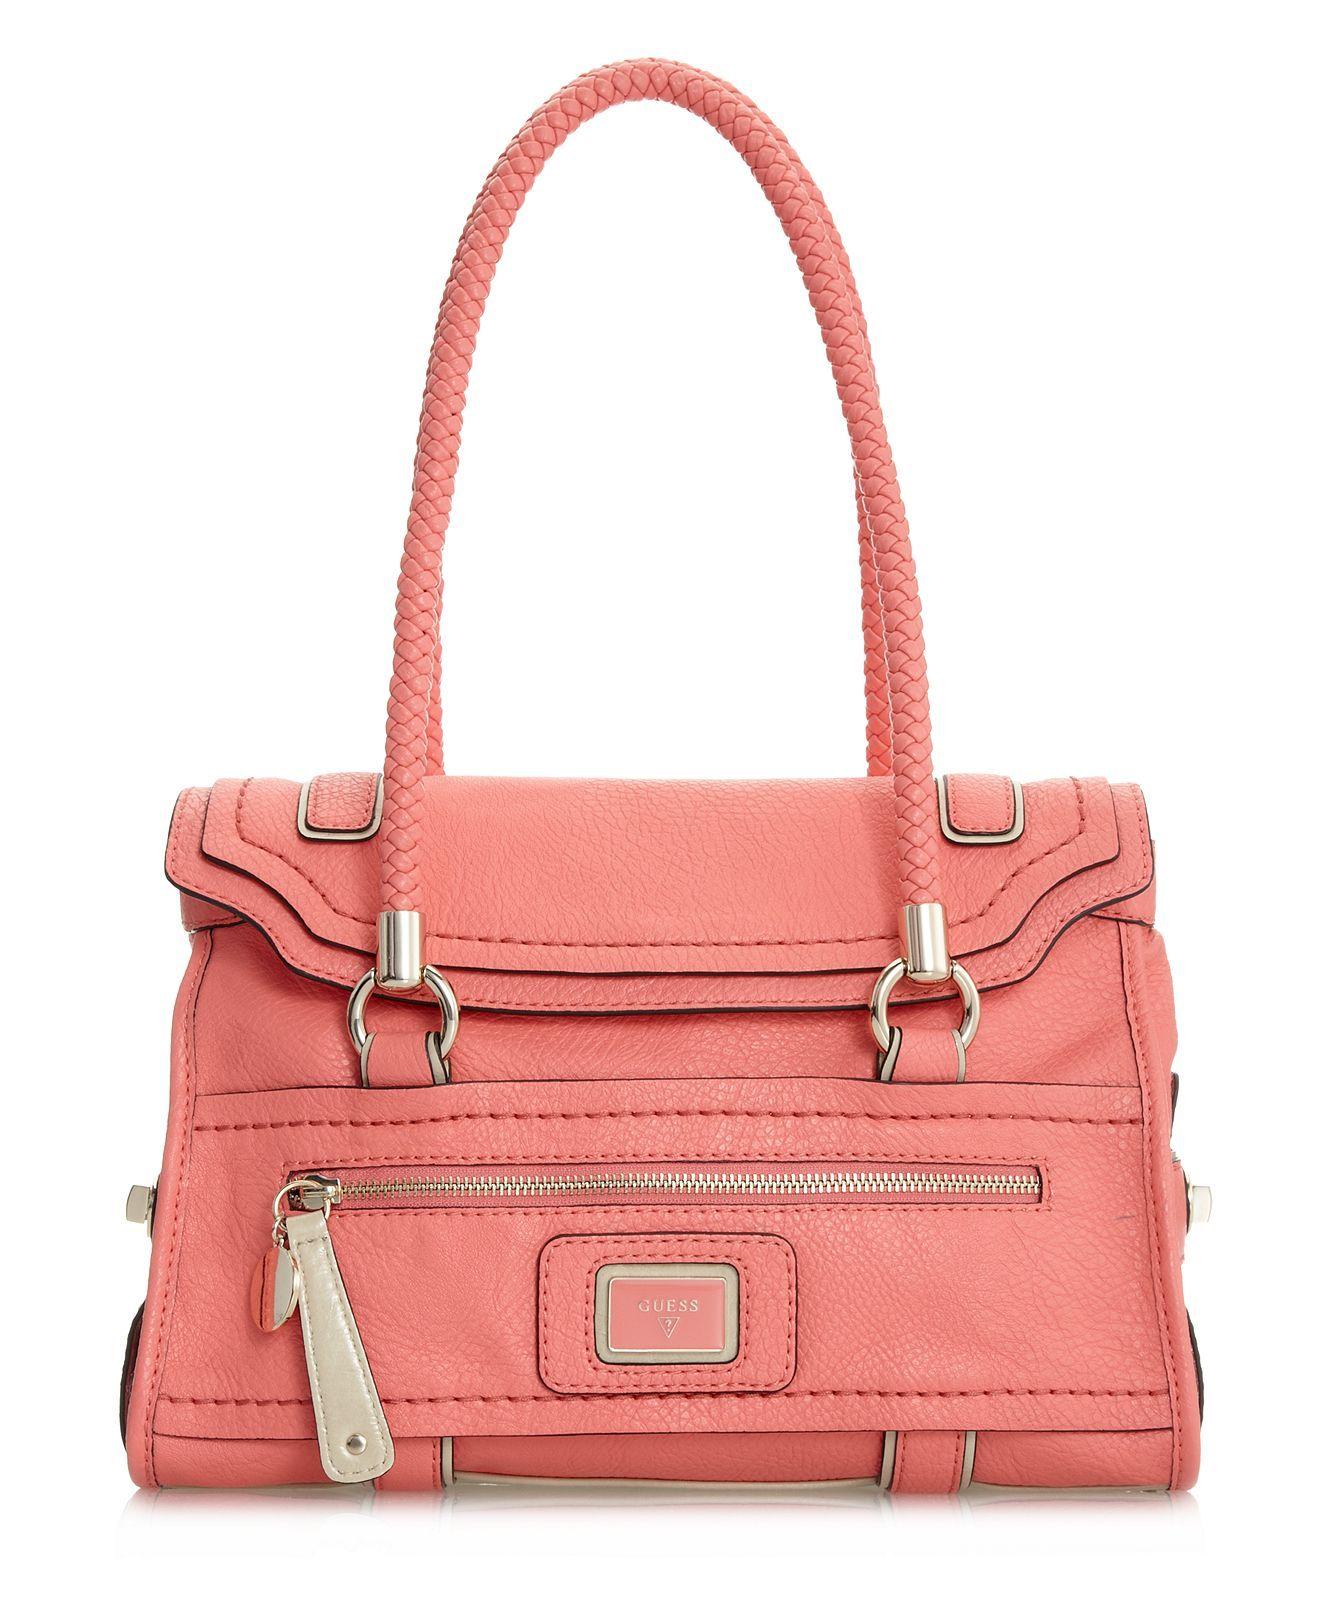 GUESS Handbag, Talina Flap Satchel in Coral